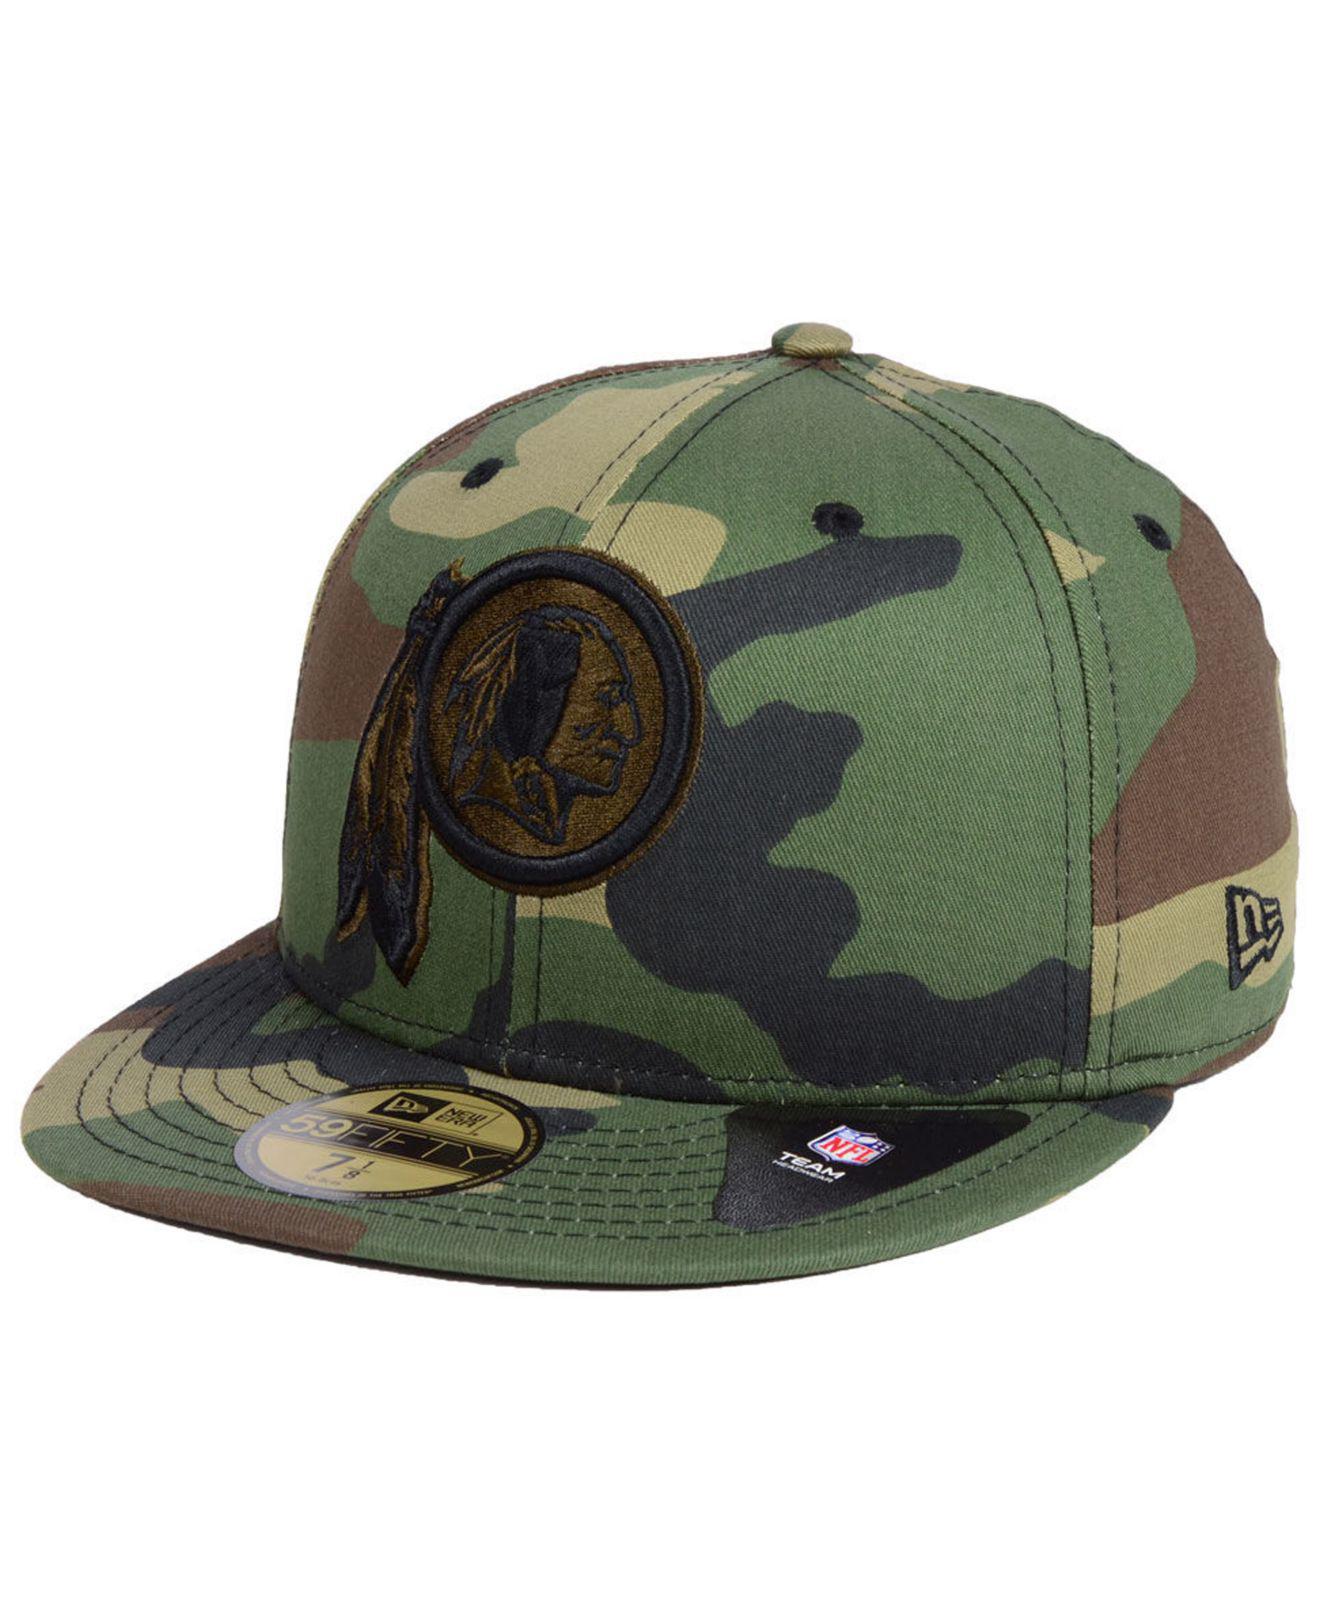 KTZ. Men s Green Washington Redskins Woodland Prism Pack 59fifty-fitted Cap 9485df6d6